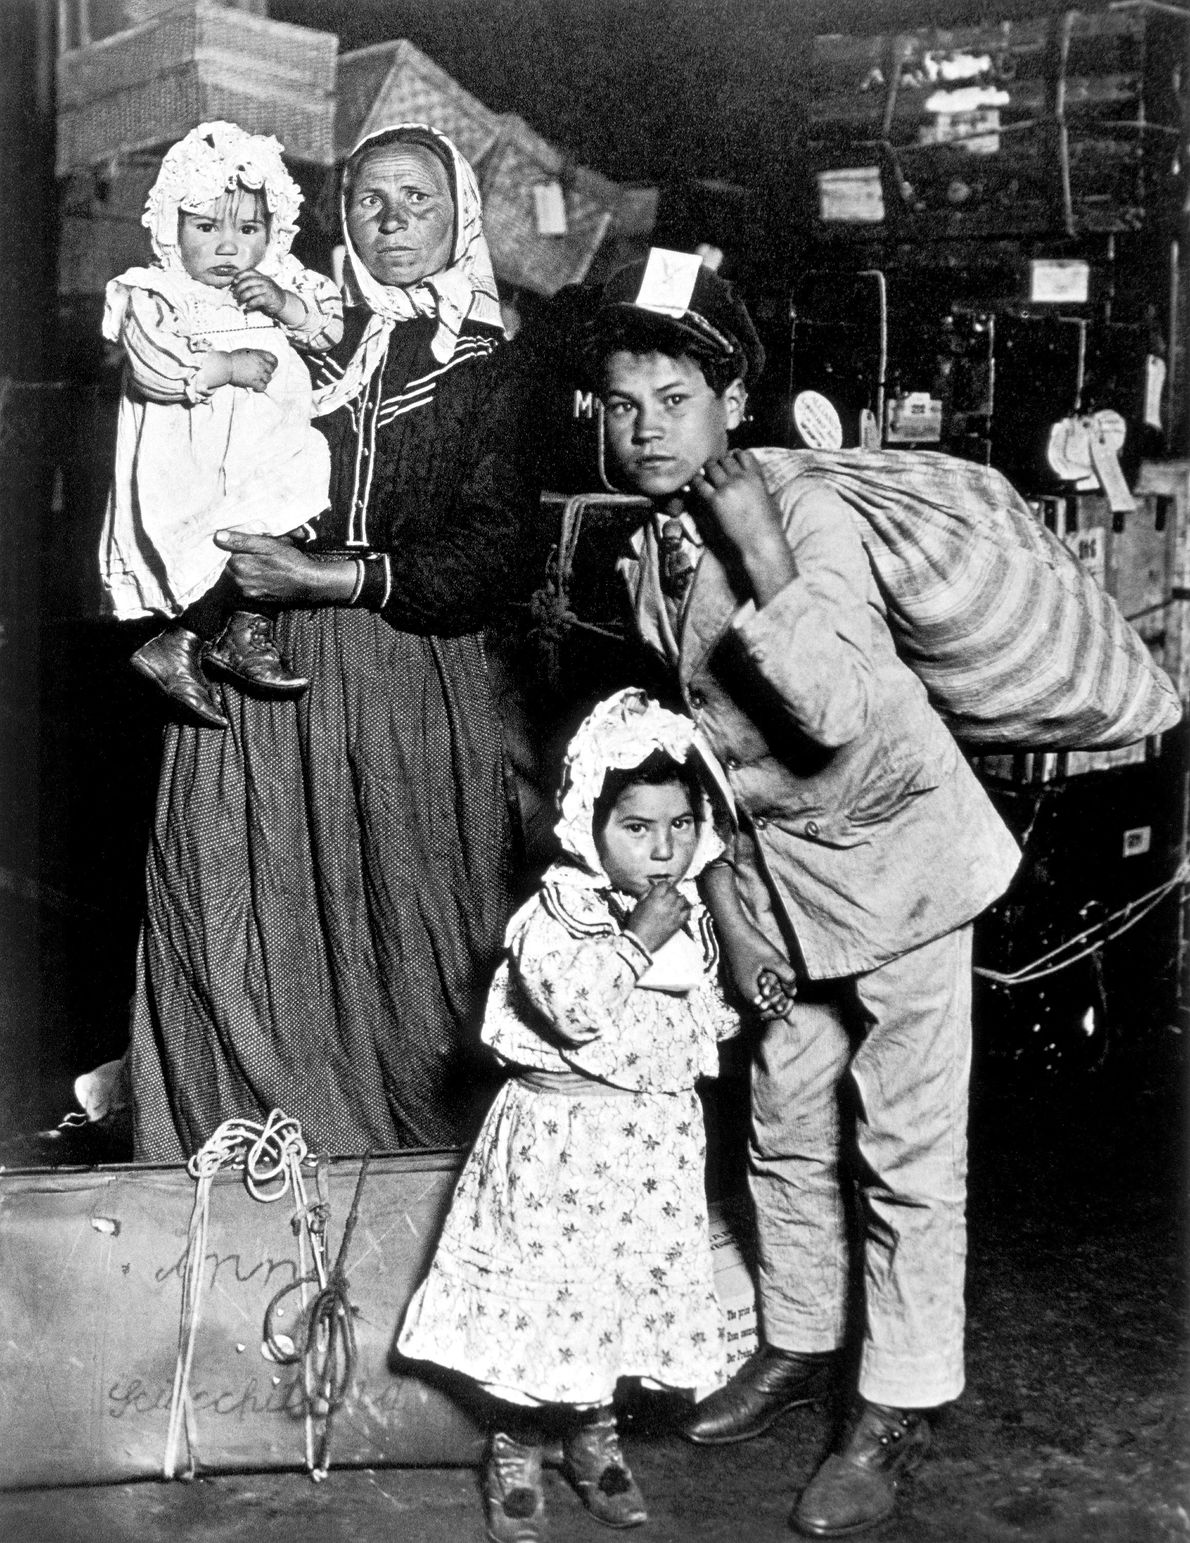 Família de imigrantes em Ellis Island